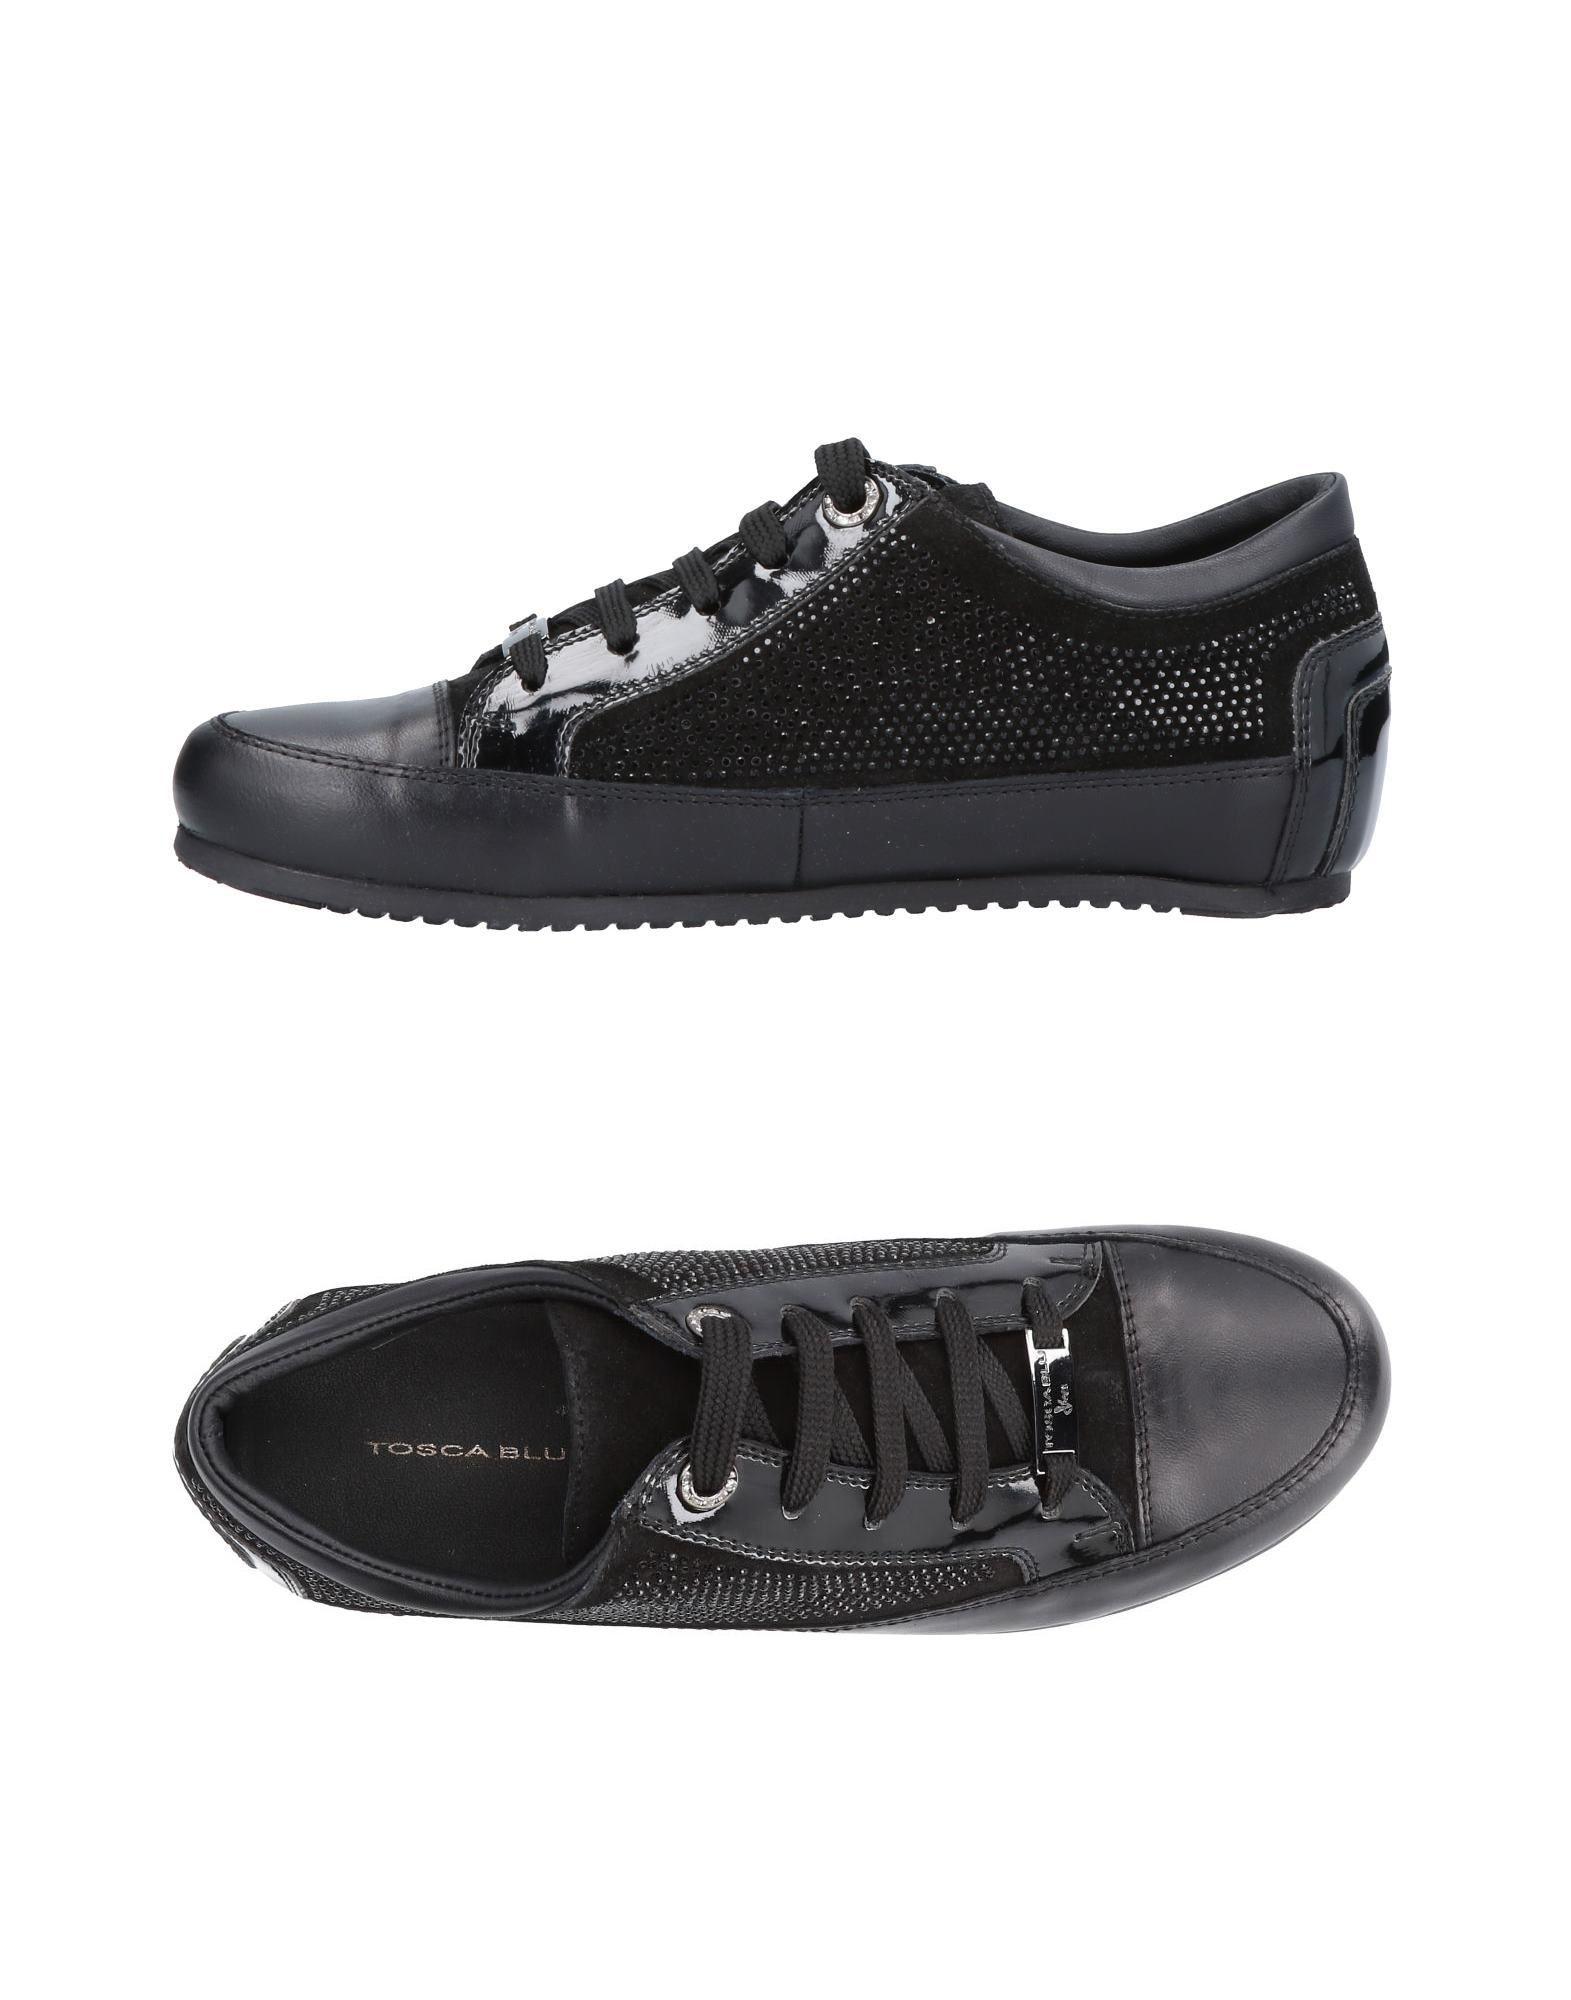 Scarpe Shoes da Ginnastica Tosca Blu Shoes Scarpe Donna - 11468222JK 0963e5